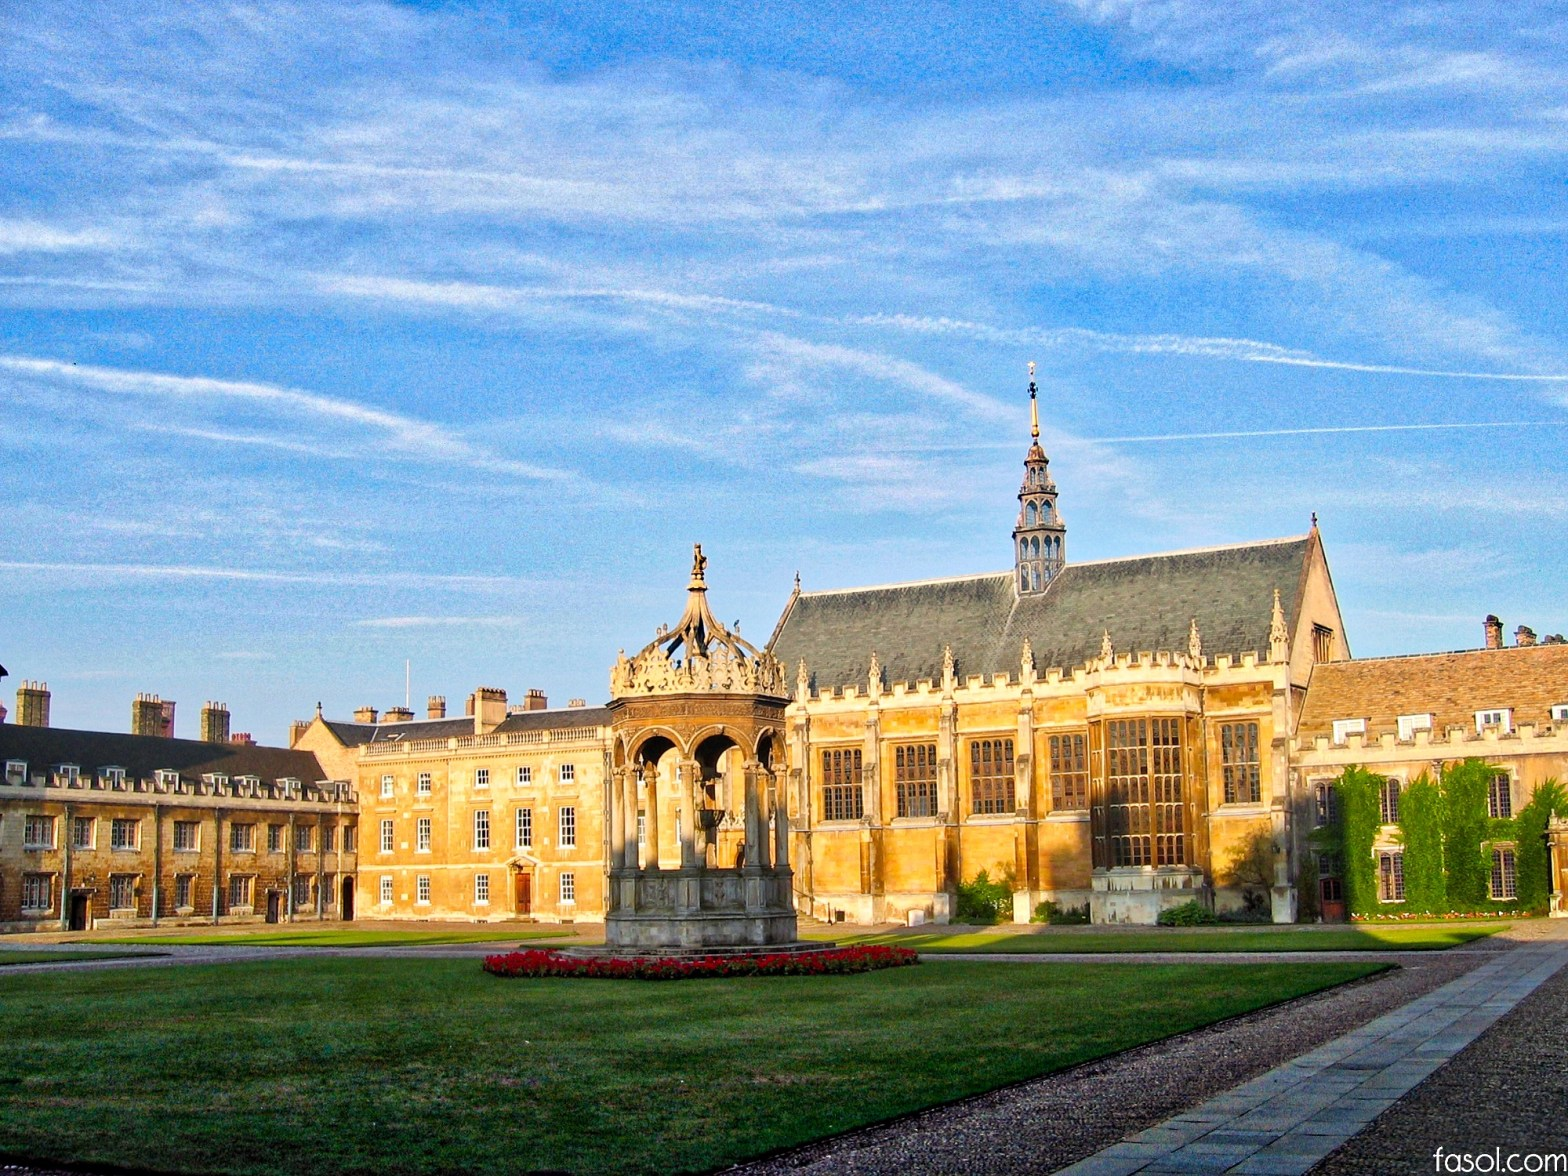 Trinity College. Cambridge University. Trinity in Japan